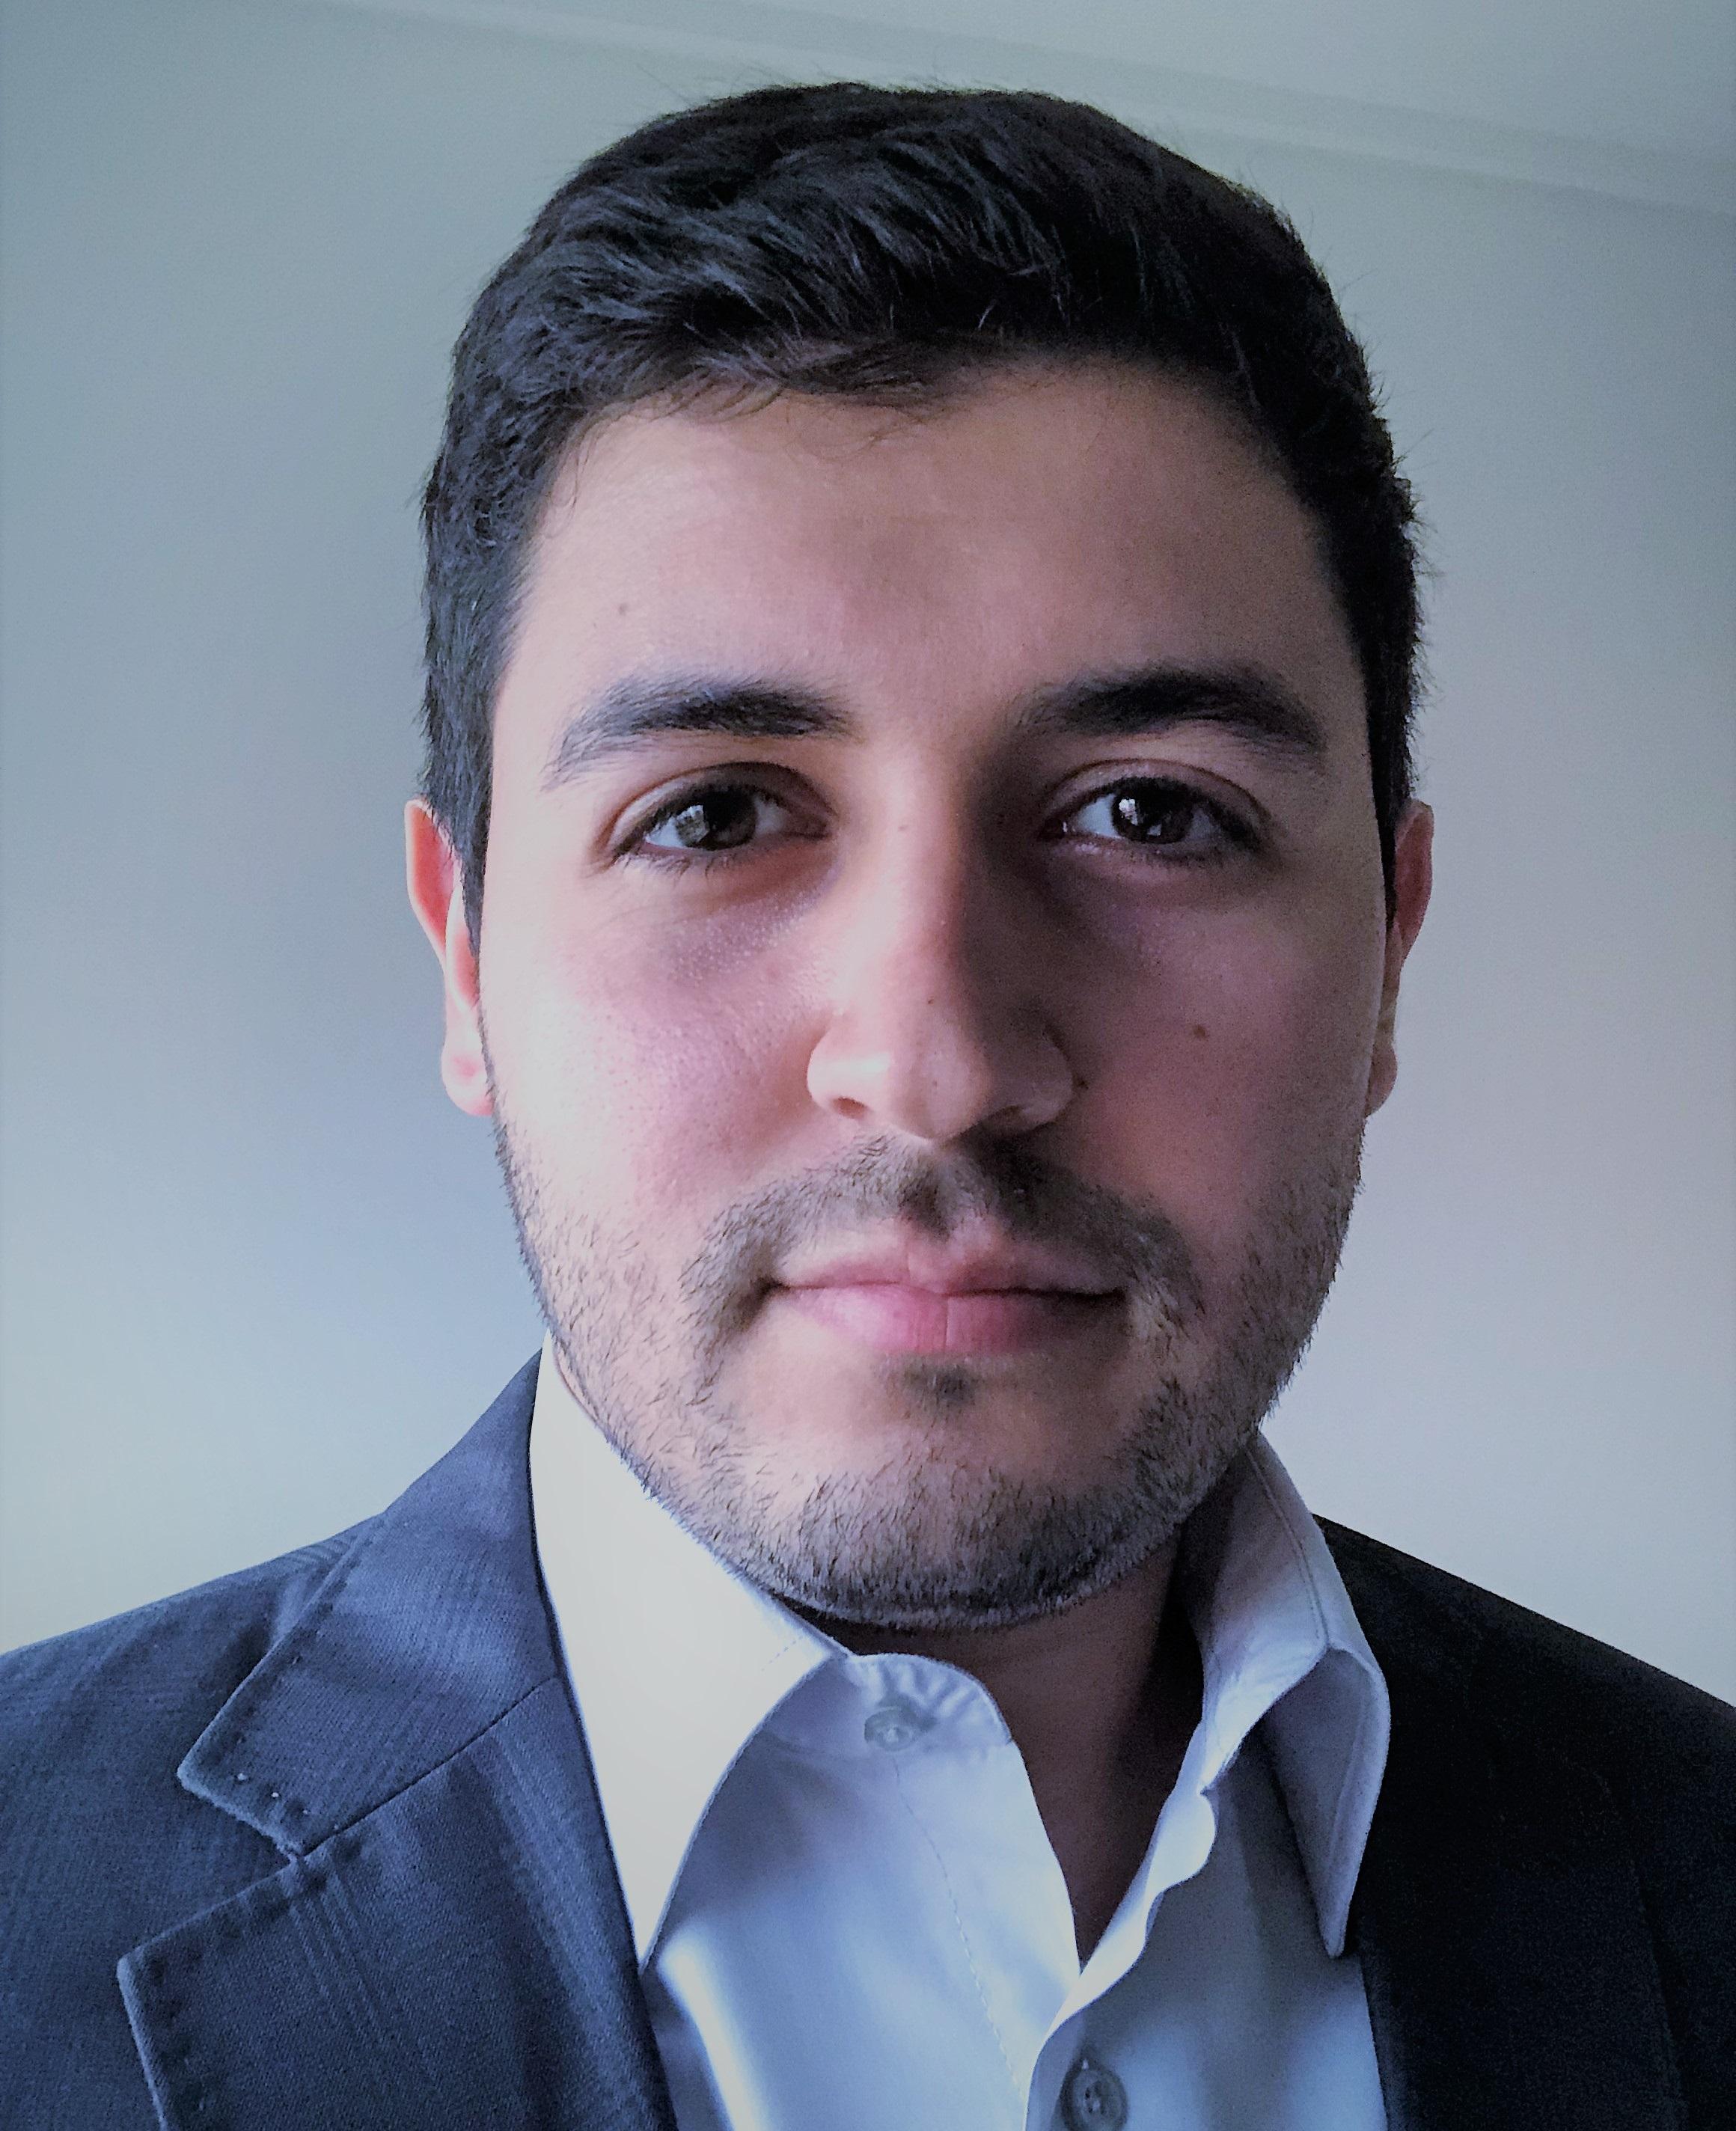 Mr Ahmed S. Musleh